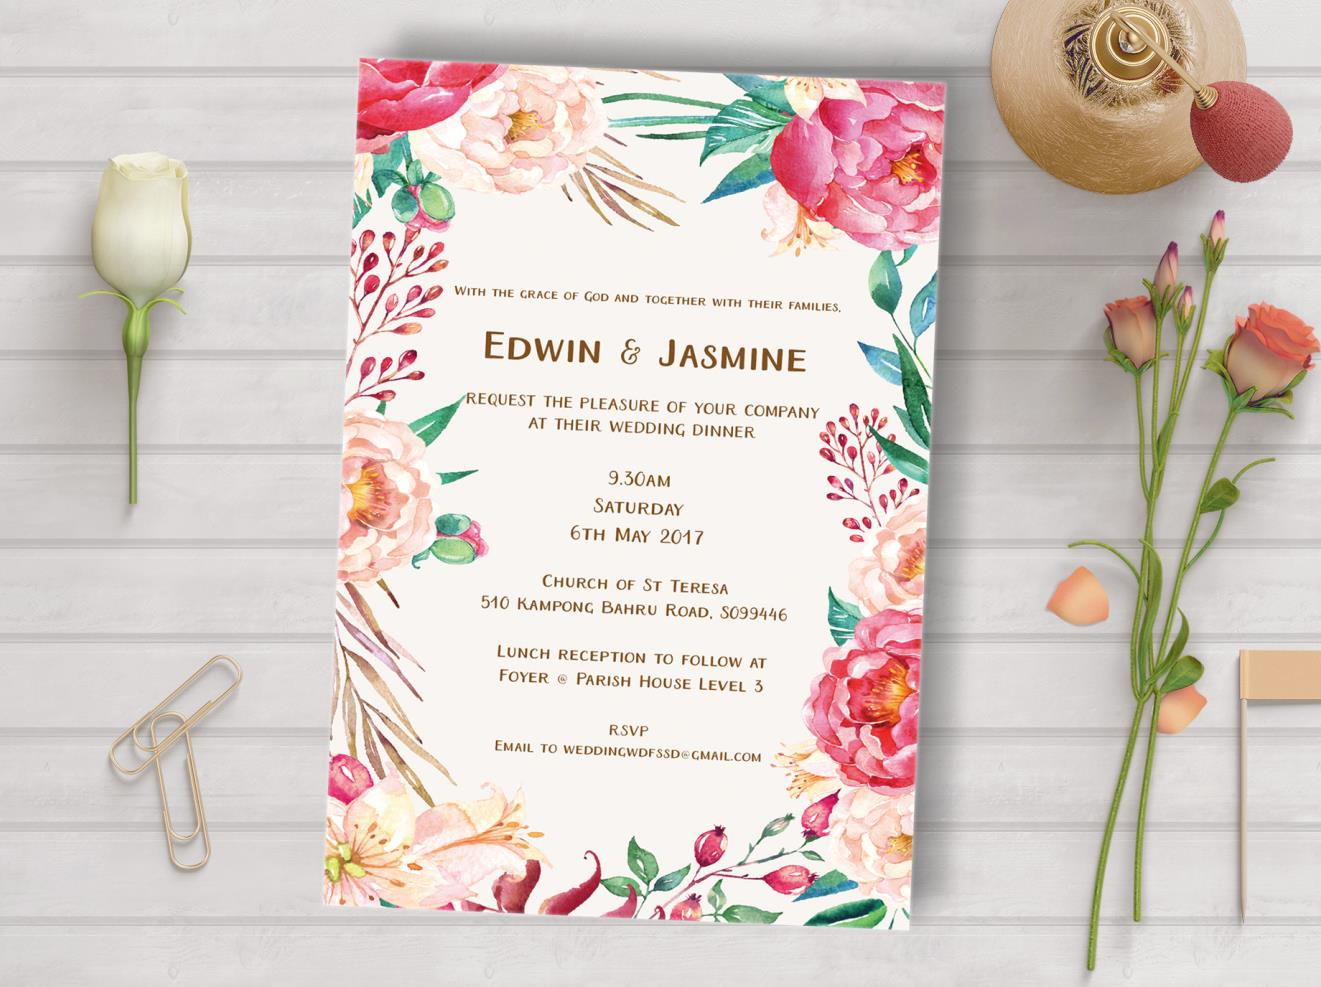 Gift List Wording For Wedding Invitations: Wedding Invitation Wording Samples & Tips